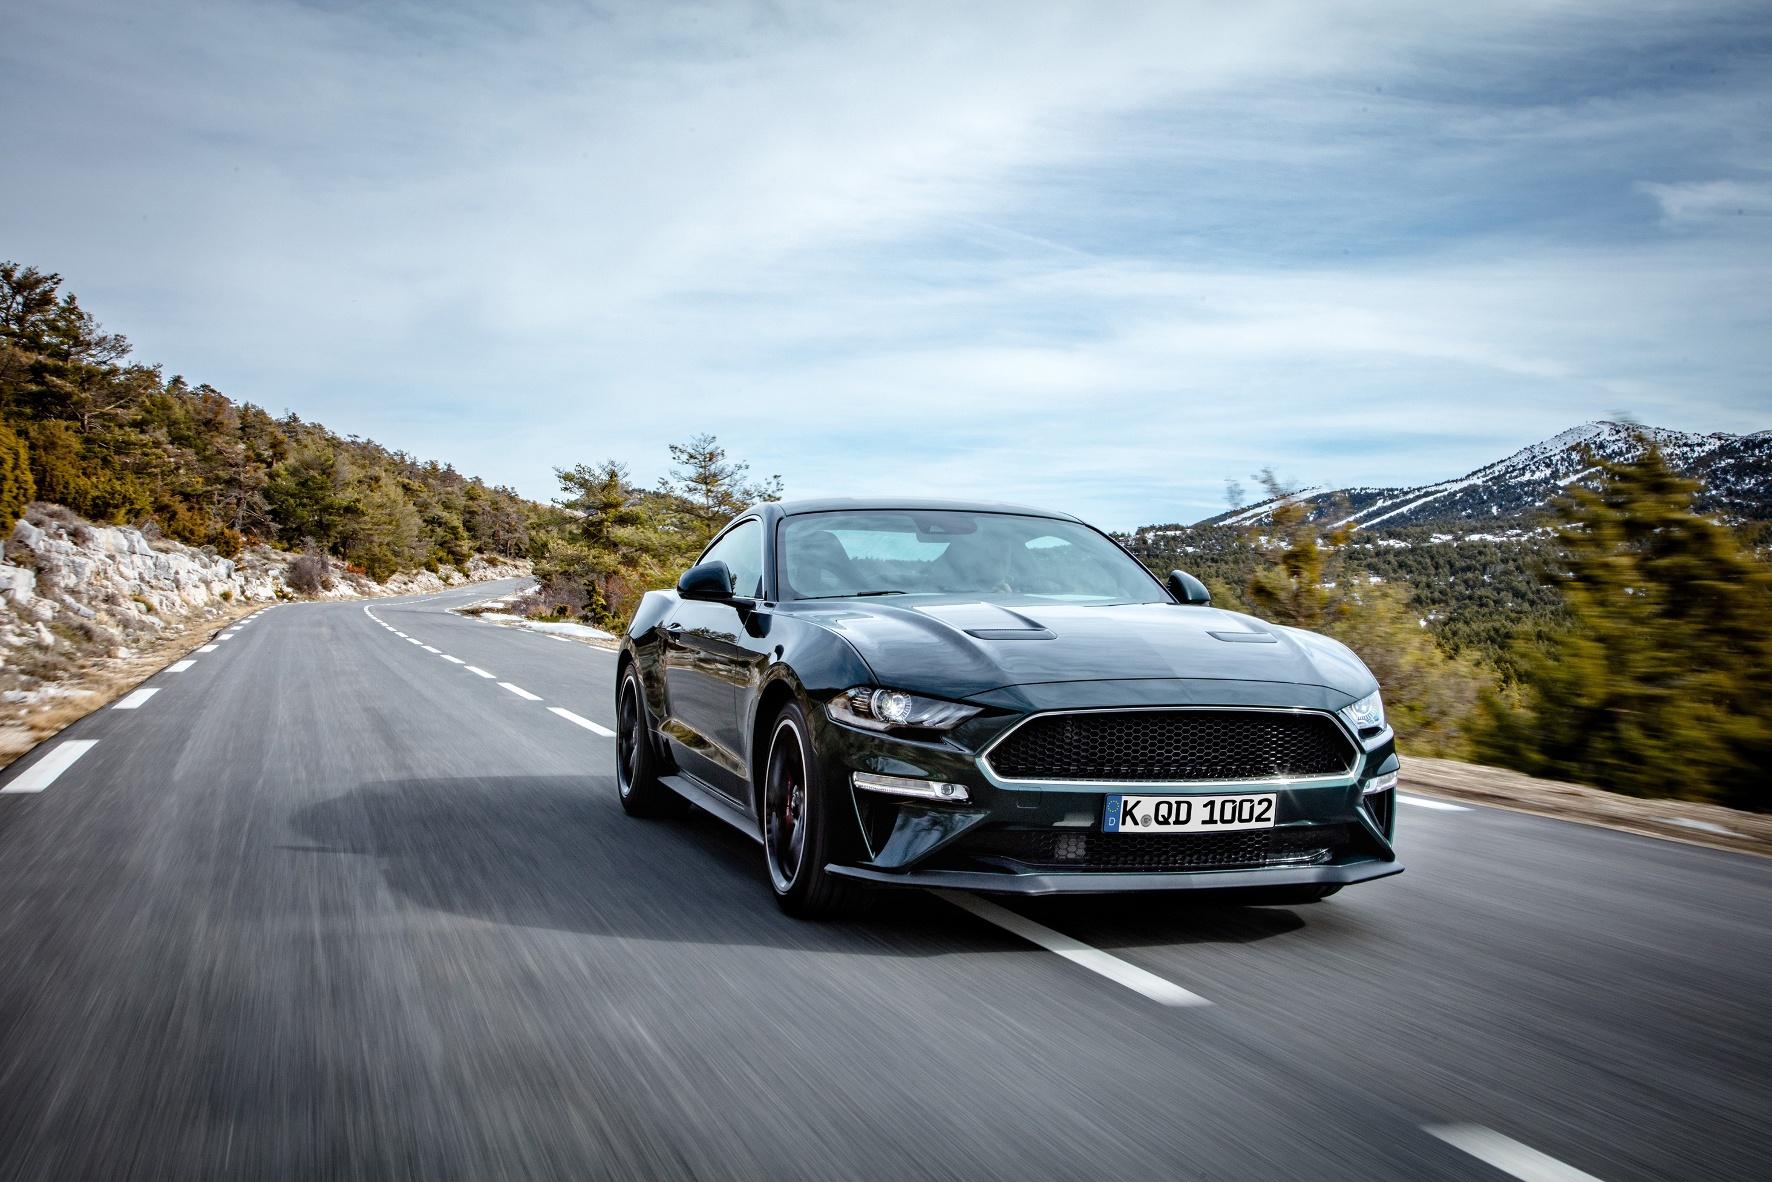 Ford Mustang Bullitt: Eine Hommage an den Hollywood Klassiker